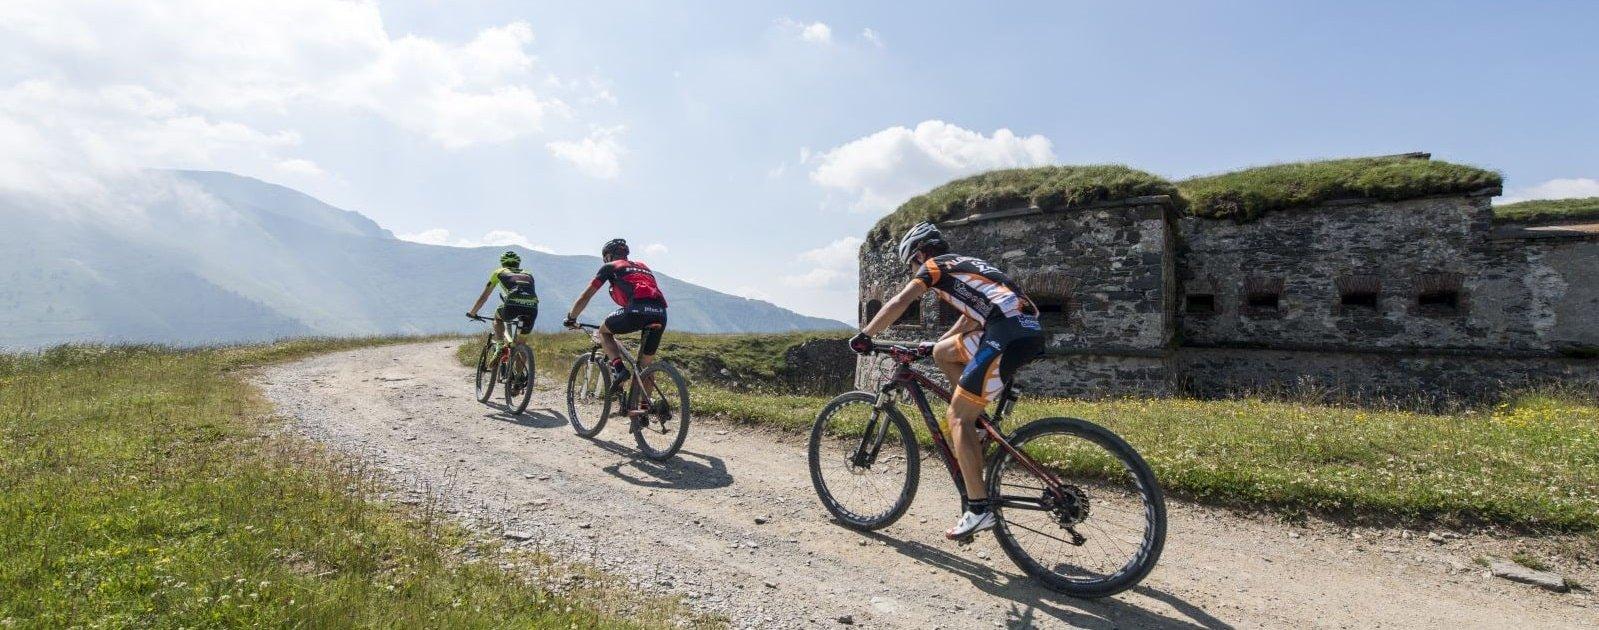 Mountainbike Tour Via del Sale (c) Limone Turismo